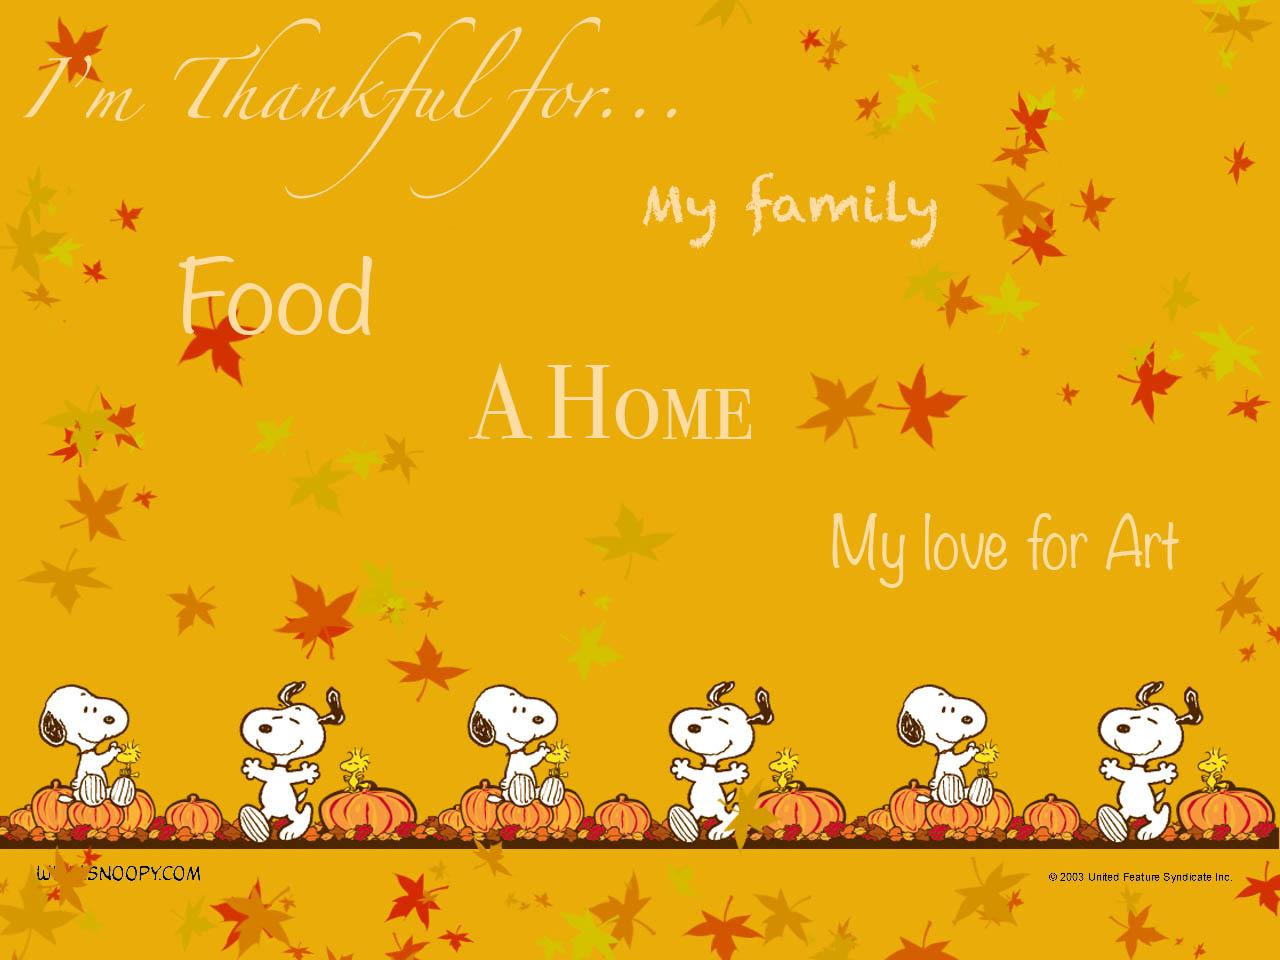 genesis_thankful